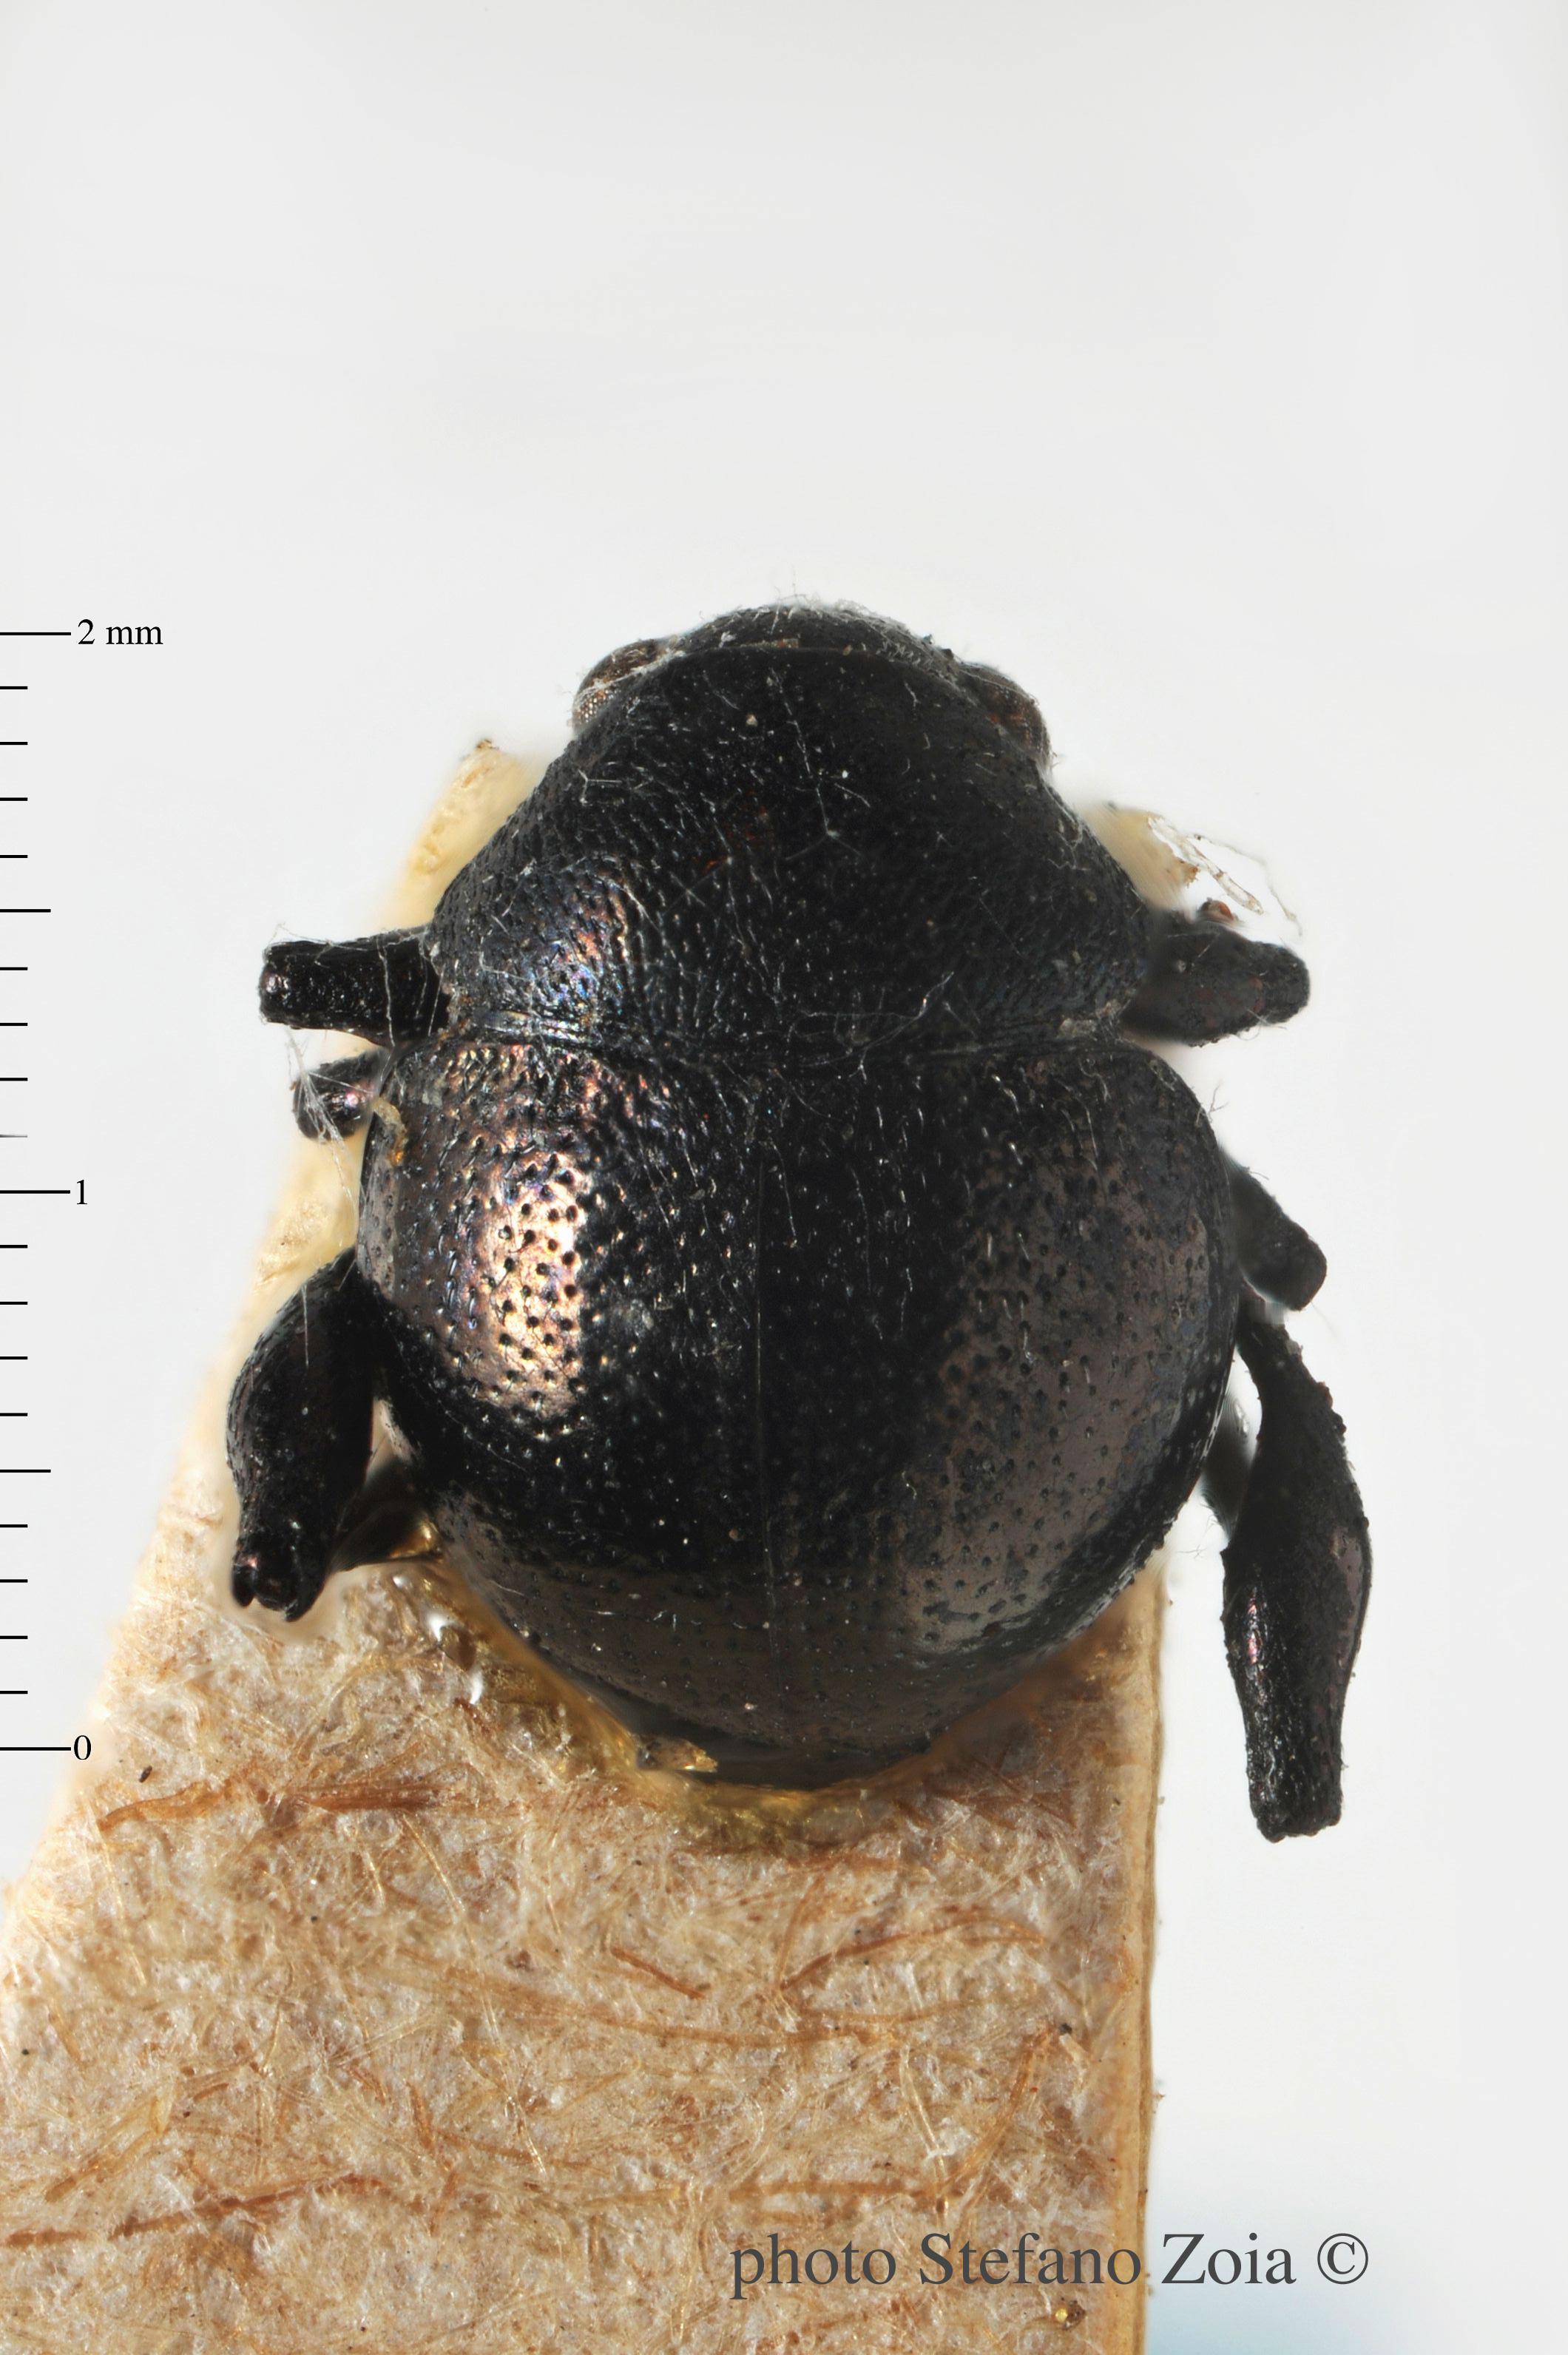 BE-RBINS-ENT Eurytus balyi 1 - 7628 - 7645.JPG